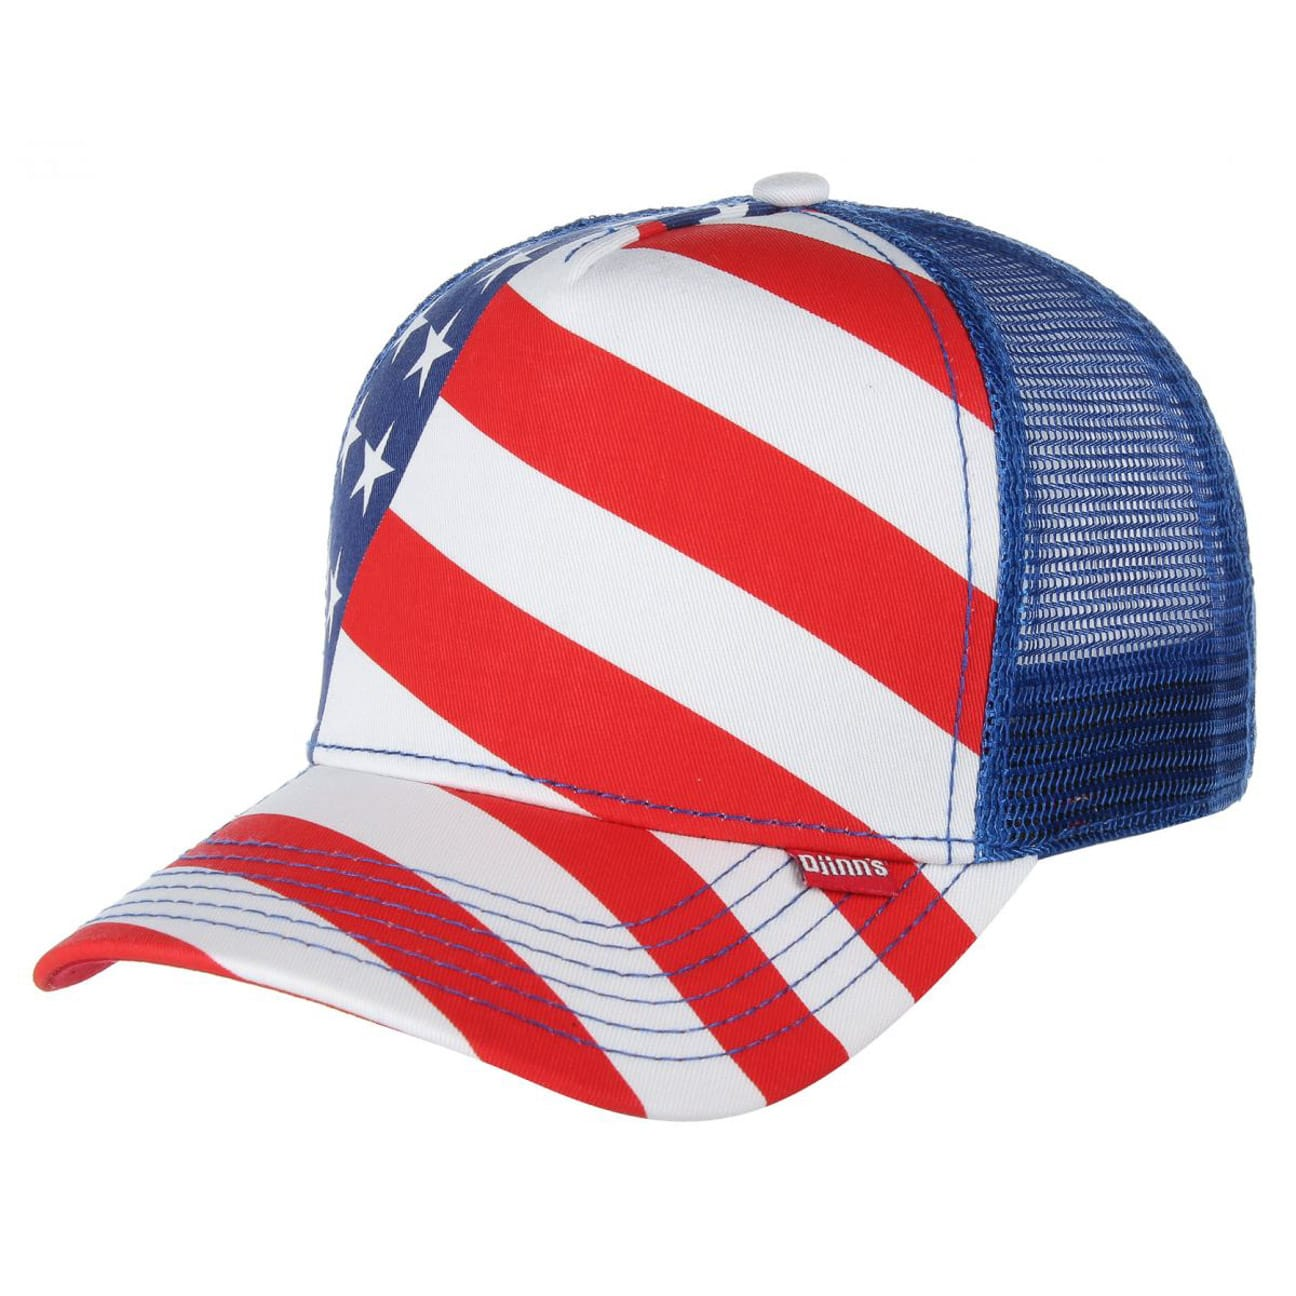 high fitted flag trucker cap by djinns eur 19 99 hats. Black Bedroom Furniture Sets. Home Design Ideas